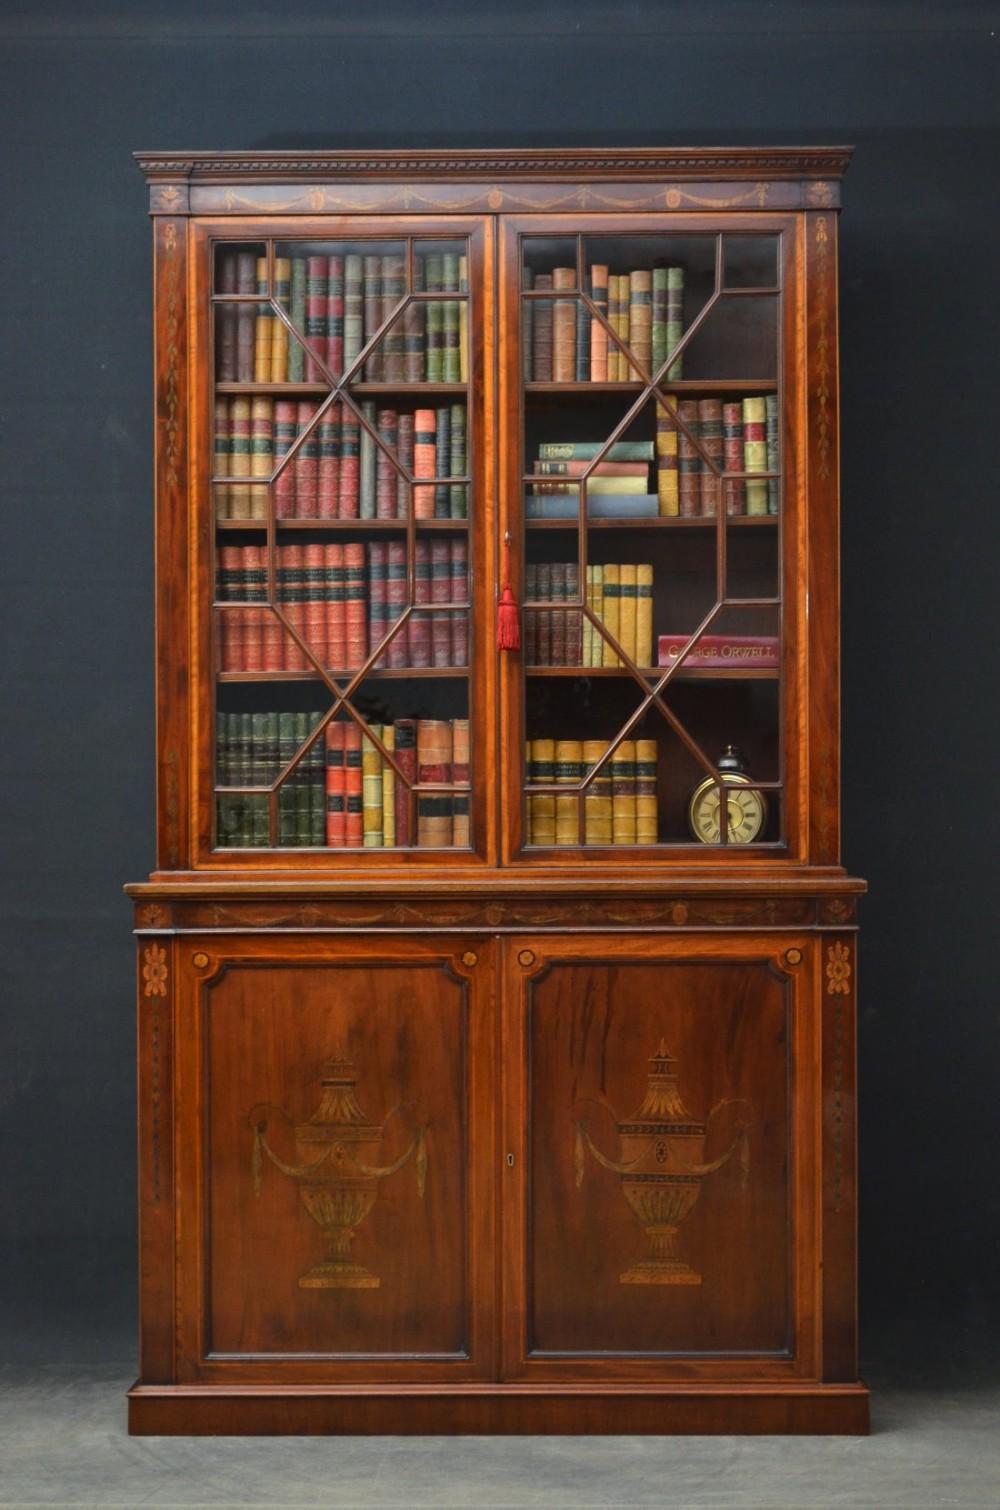 edwardian mahogany and inlaid library bookcase